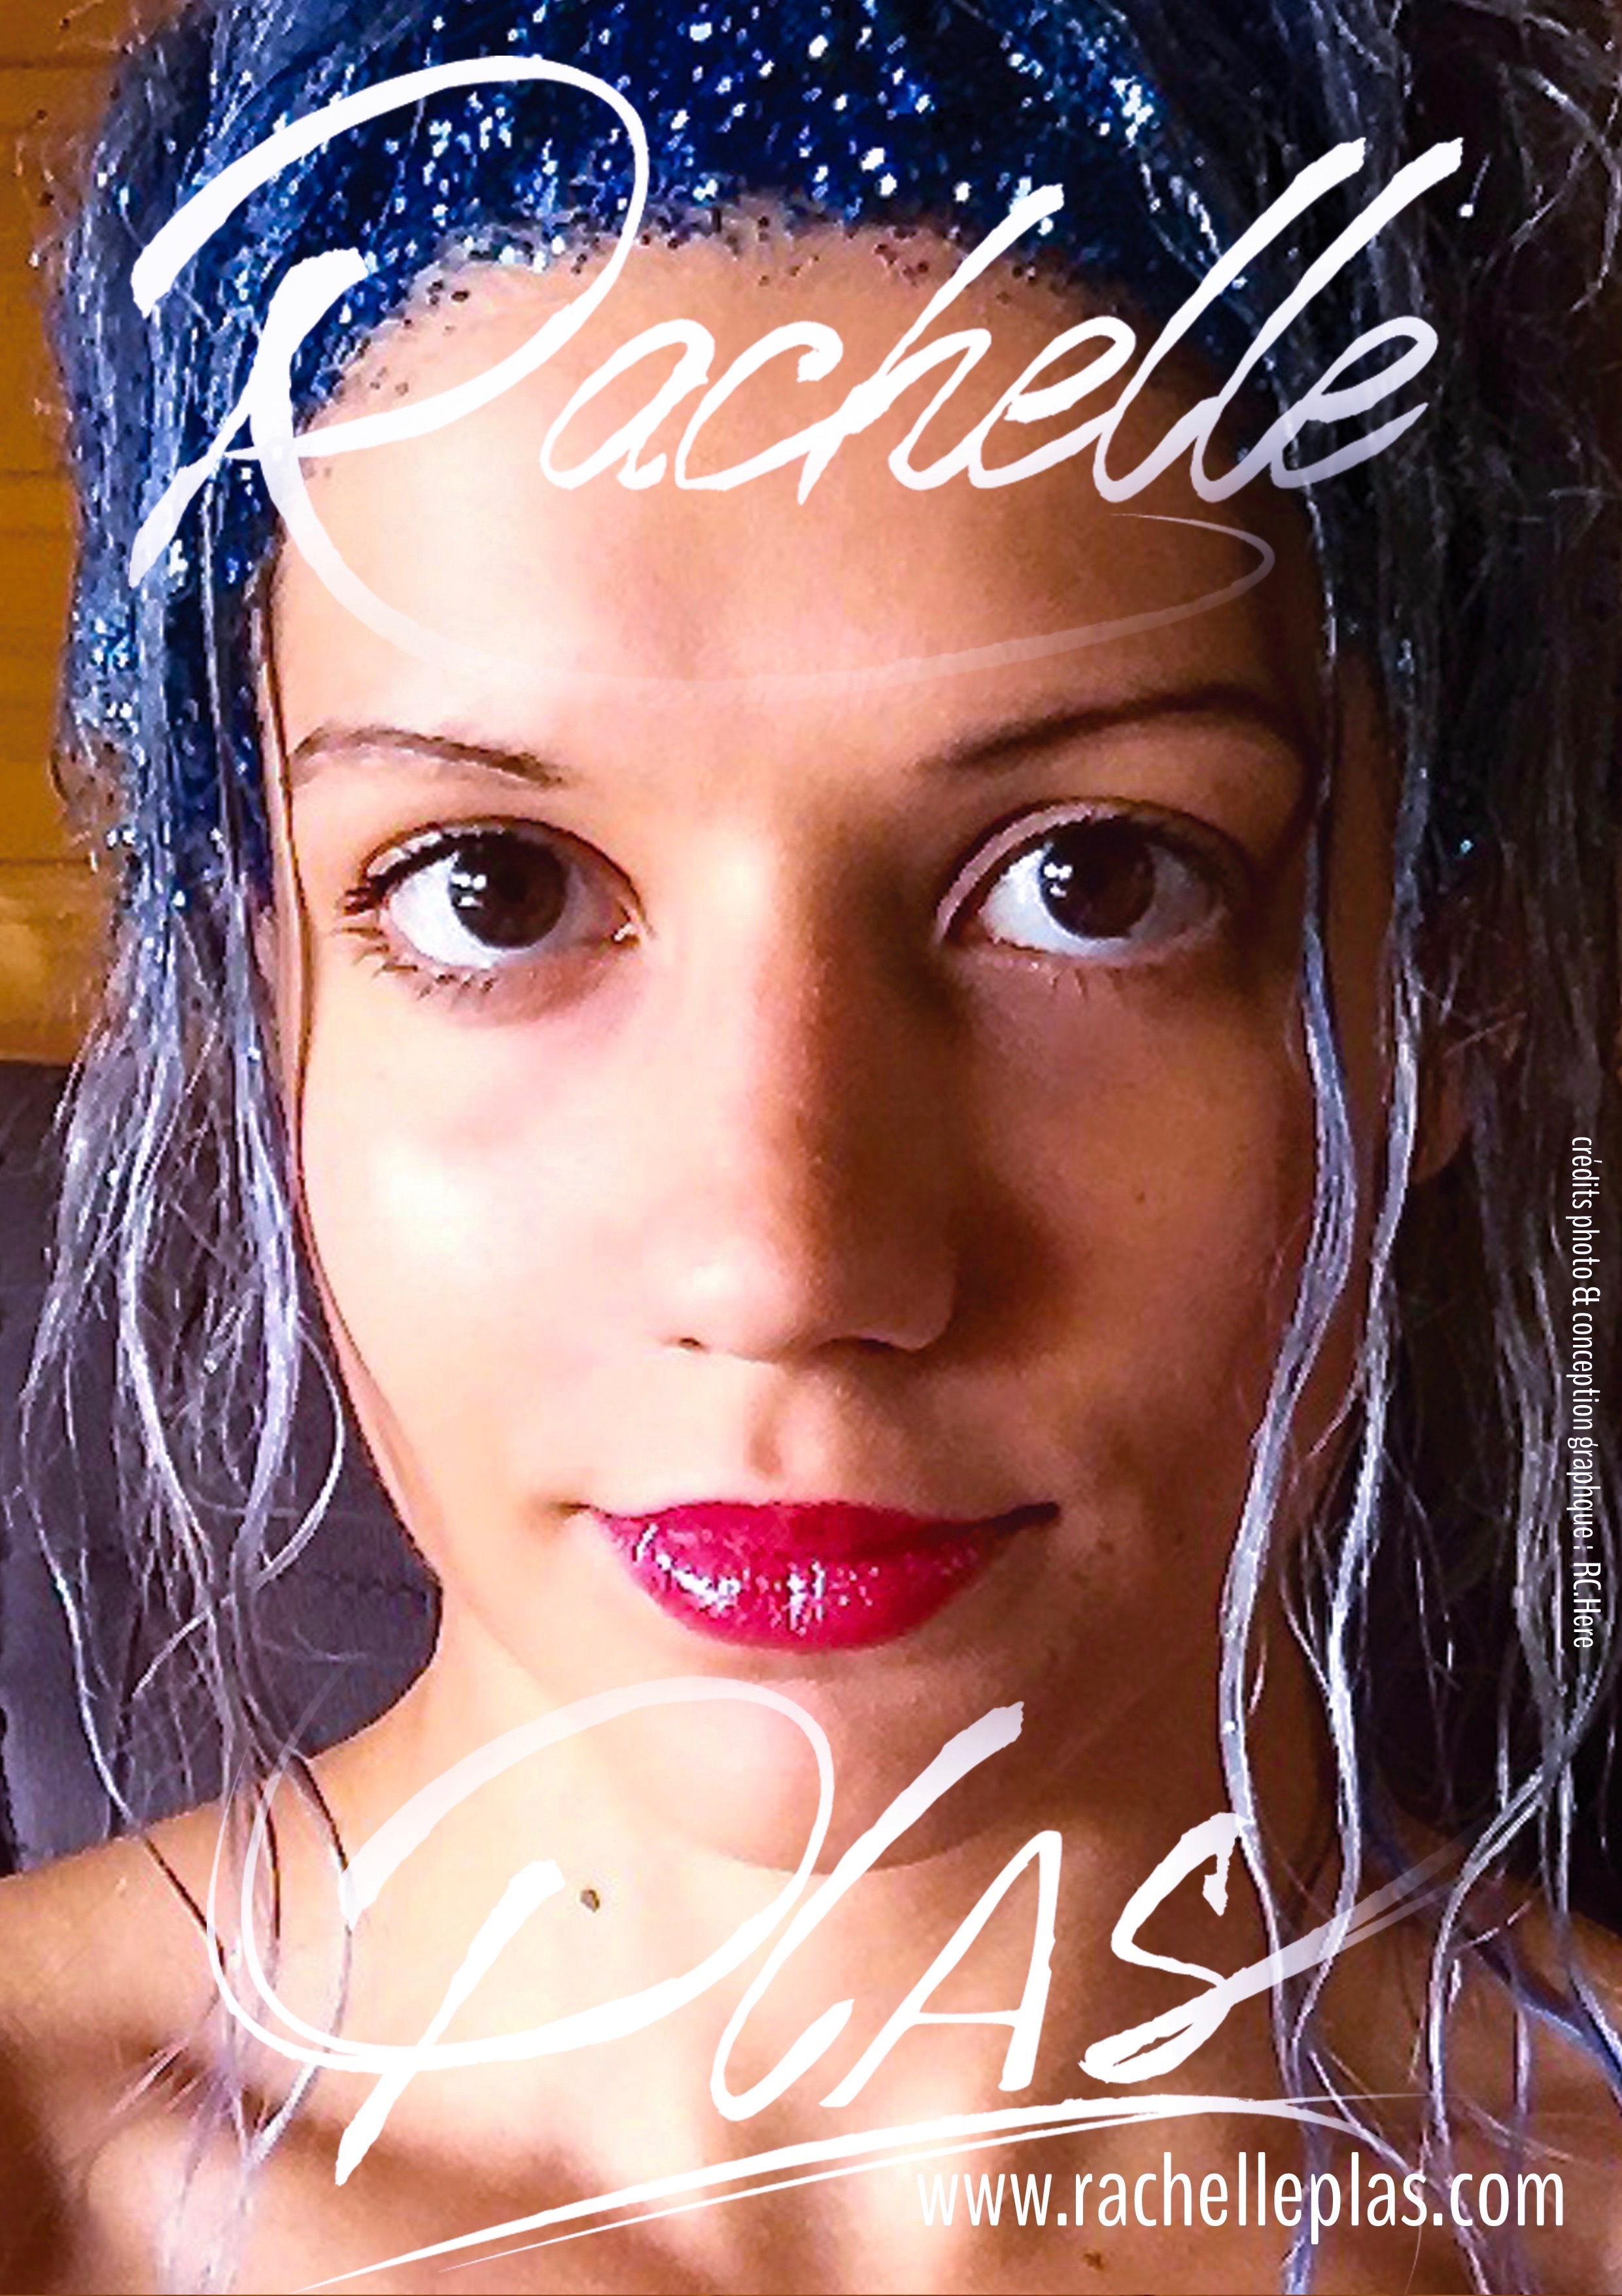 chanteuse Rachelle Plas Music Artist